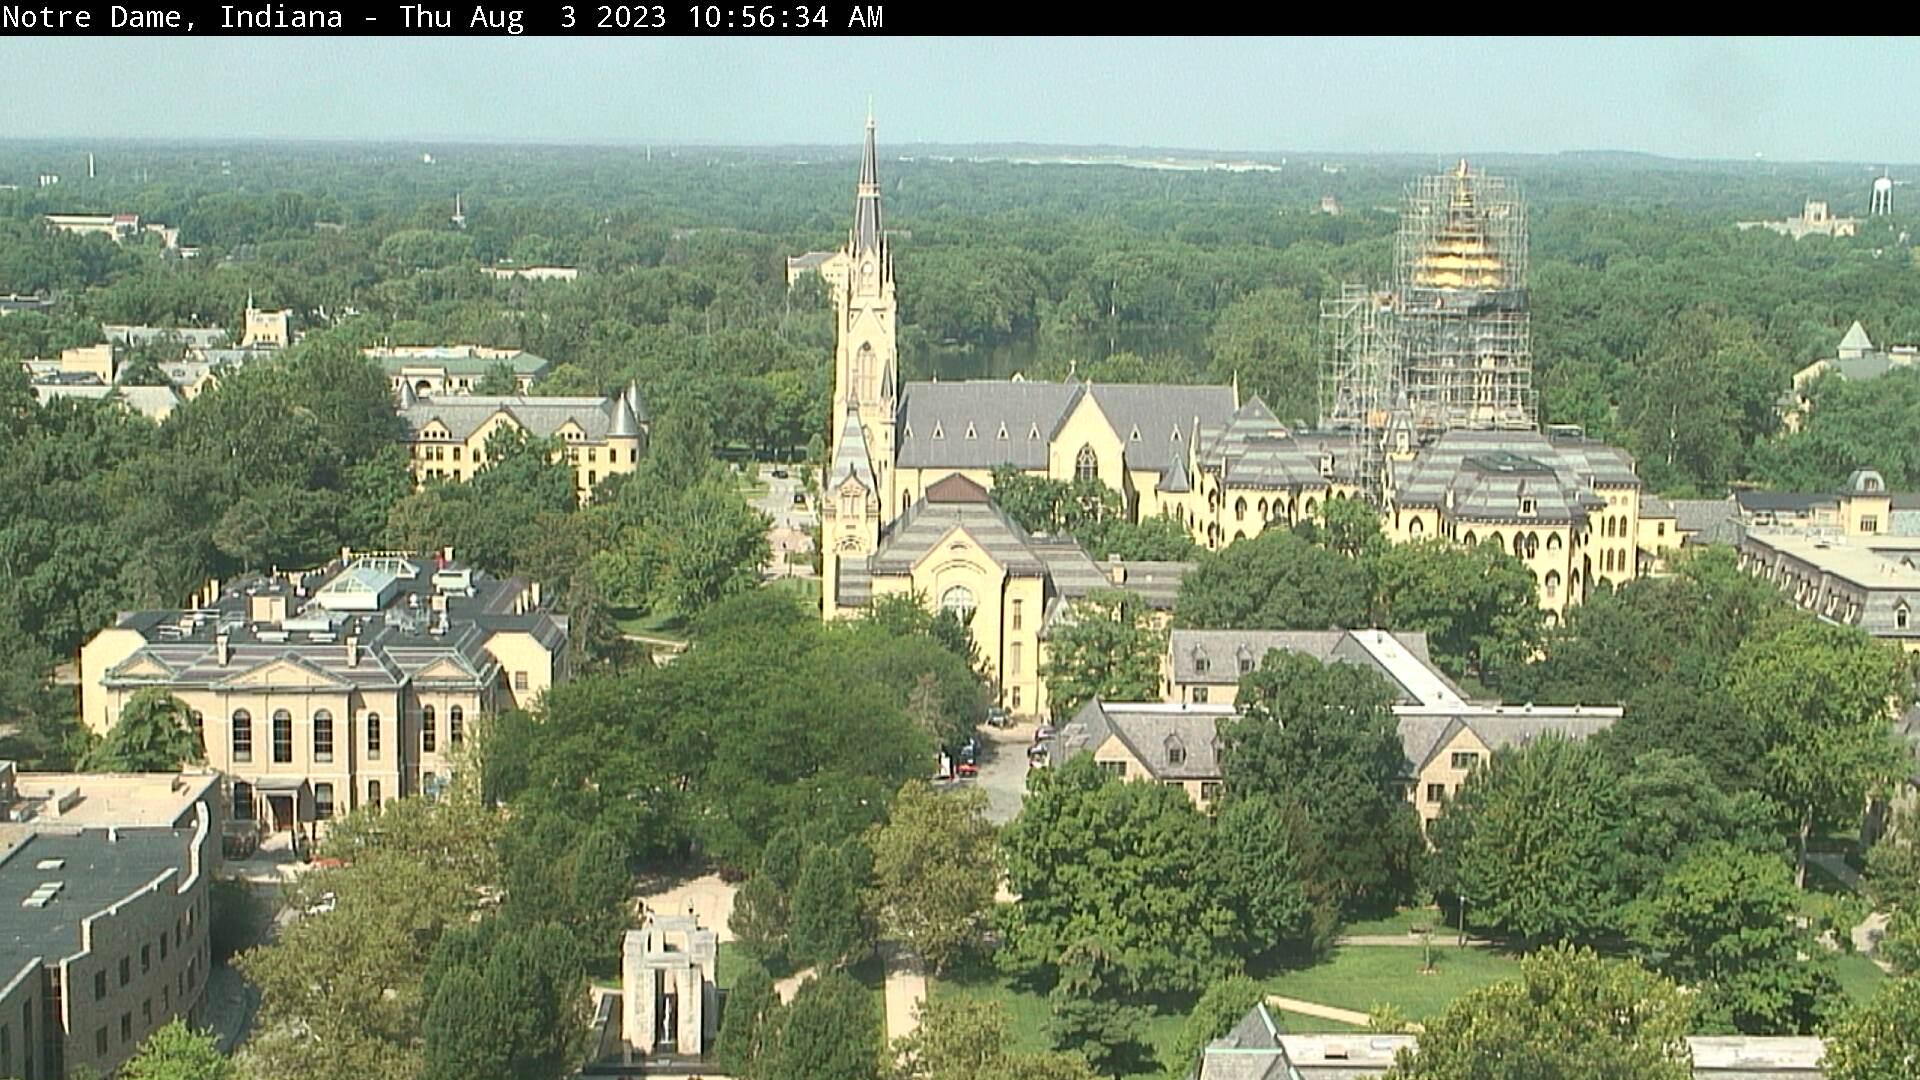 Notre Dame, Indiana Sat. 10:56